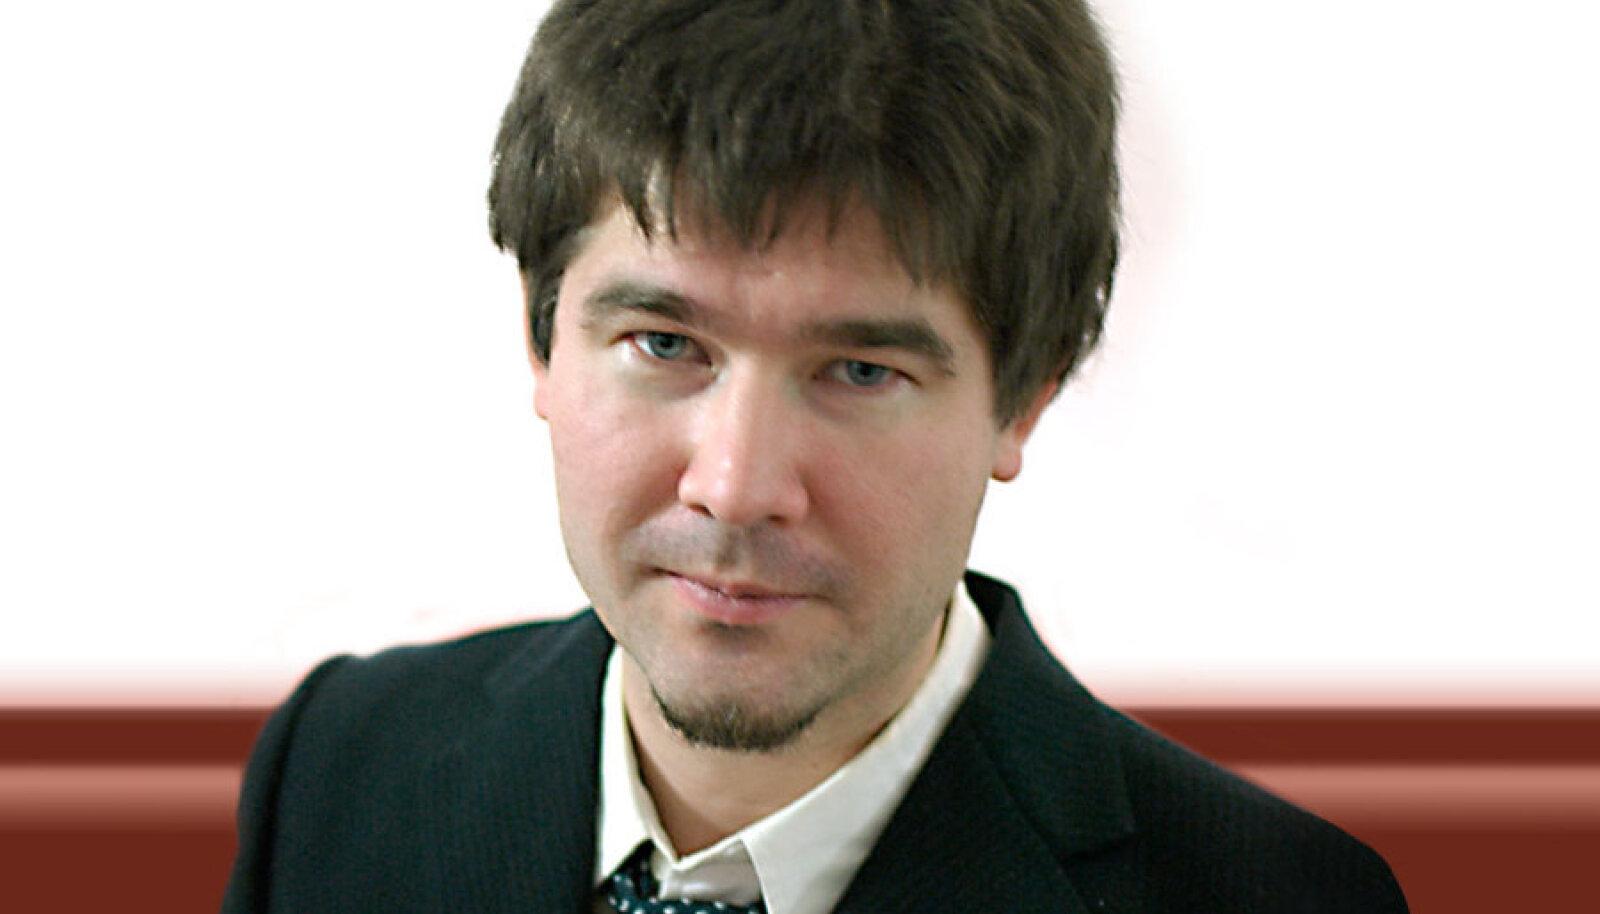 Martin Oja